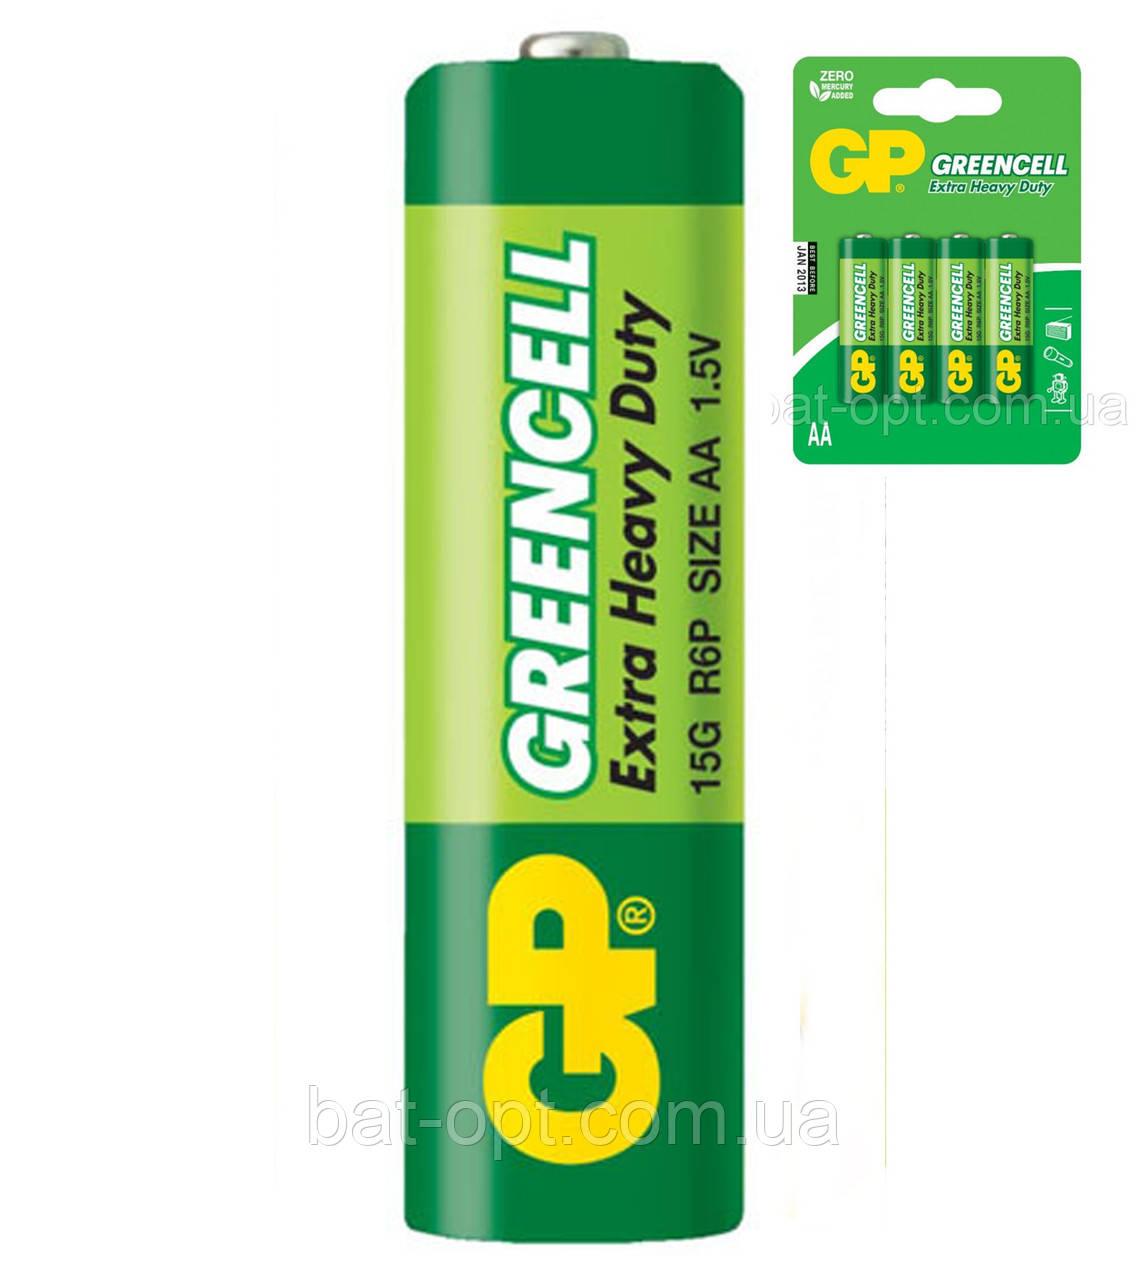 Батарейка солевая GP 15G-U4 Greencell R6 AA пальчиковая (блистер)